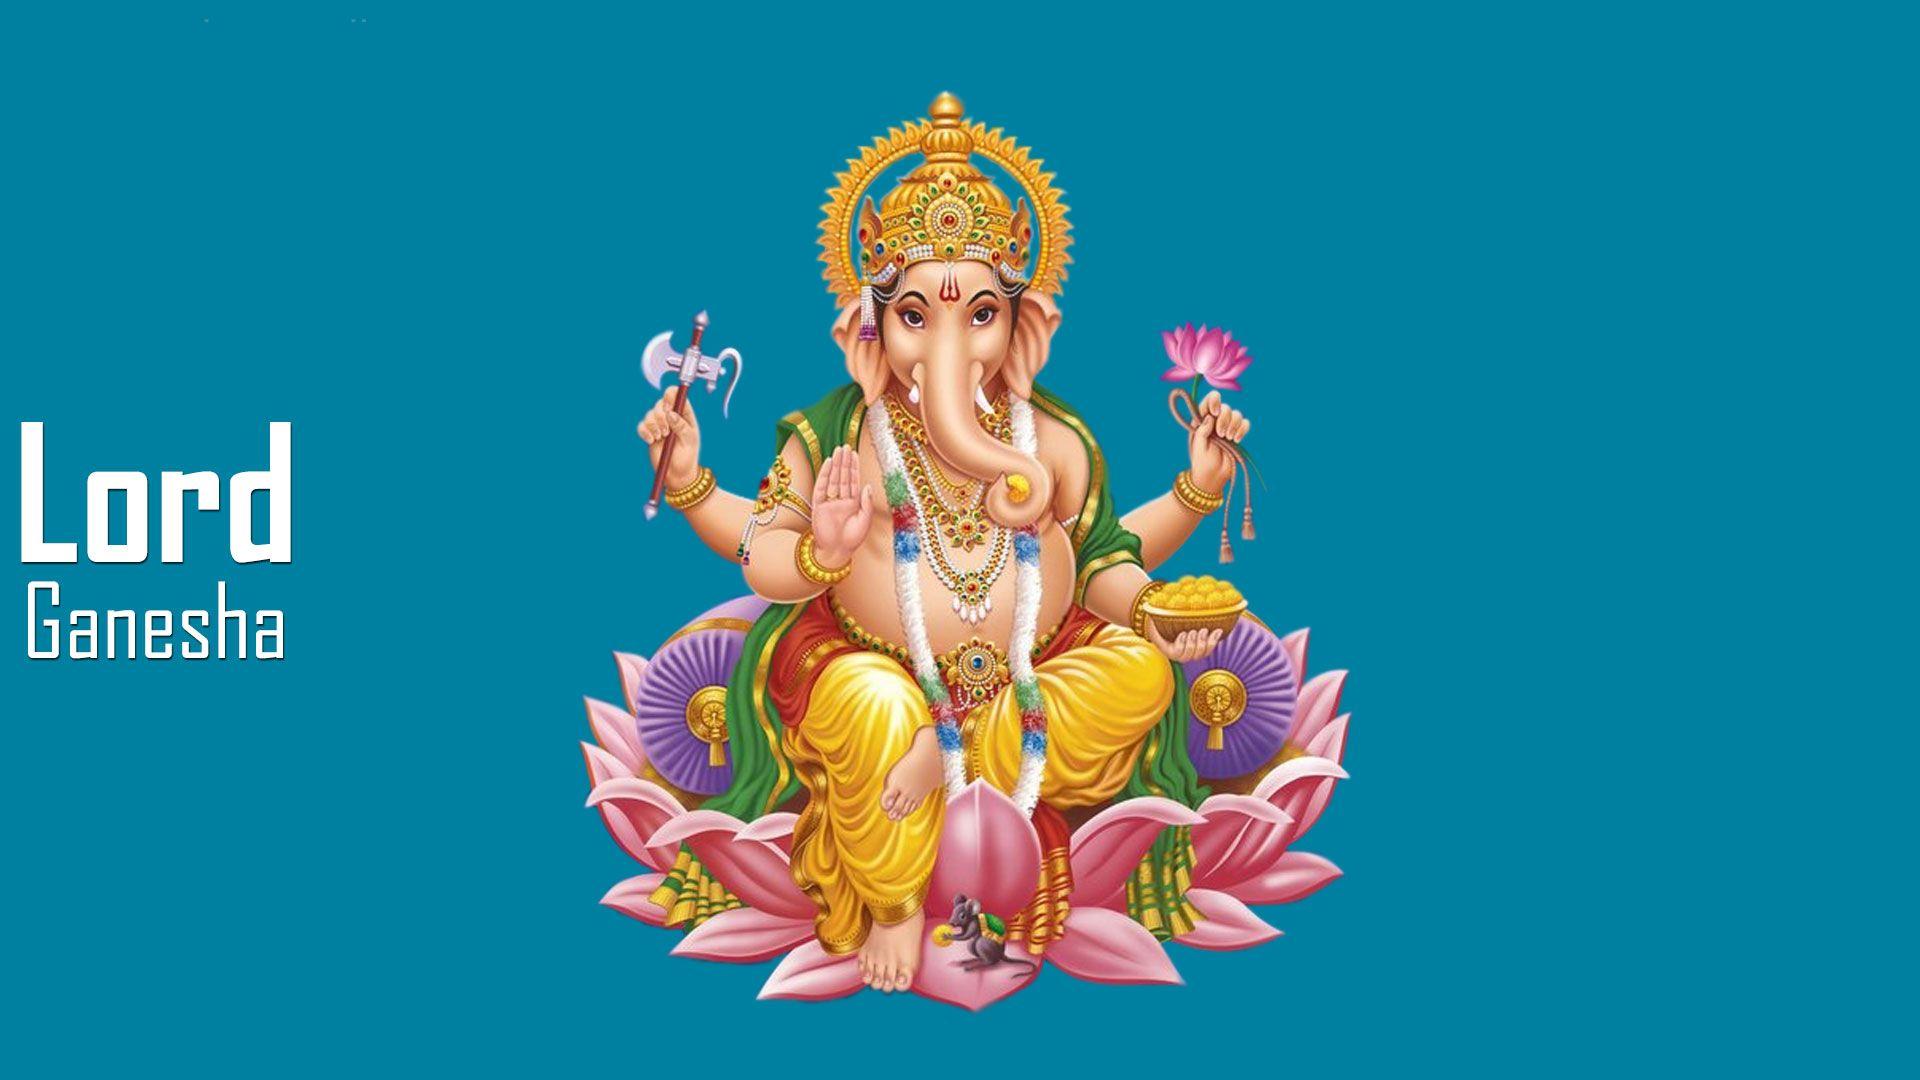 Hd Lord Ganesha Images